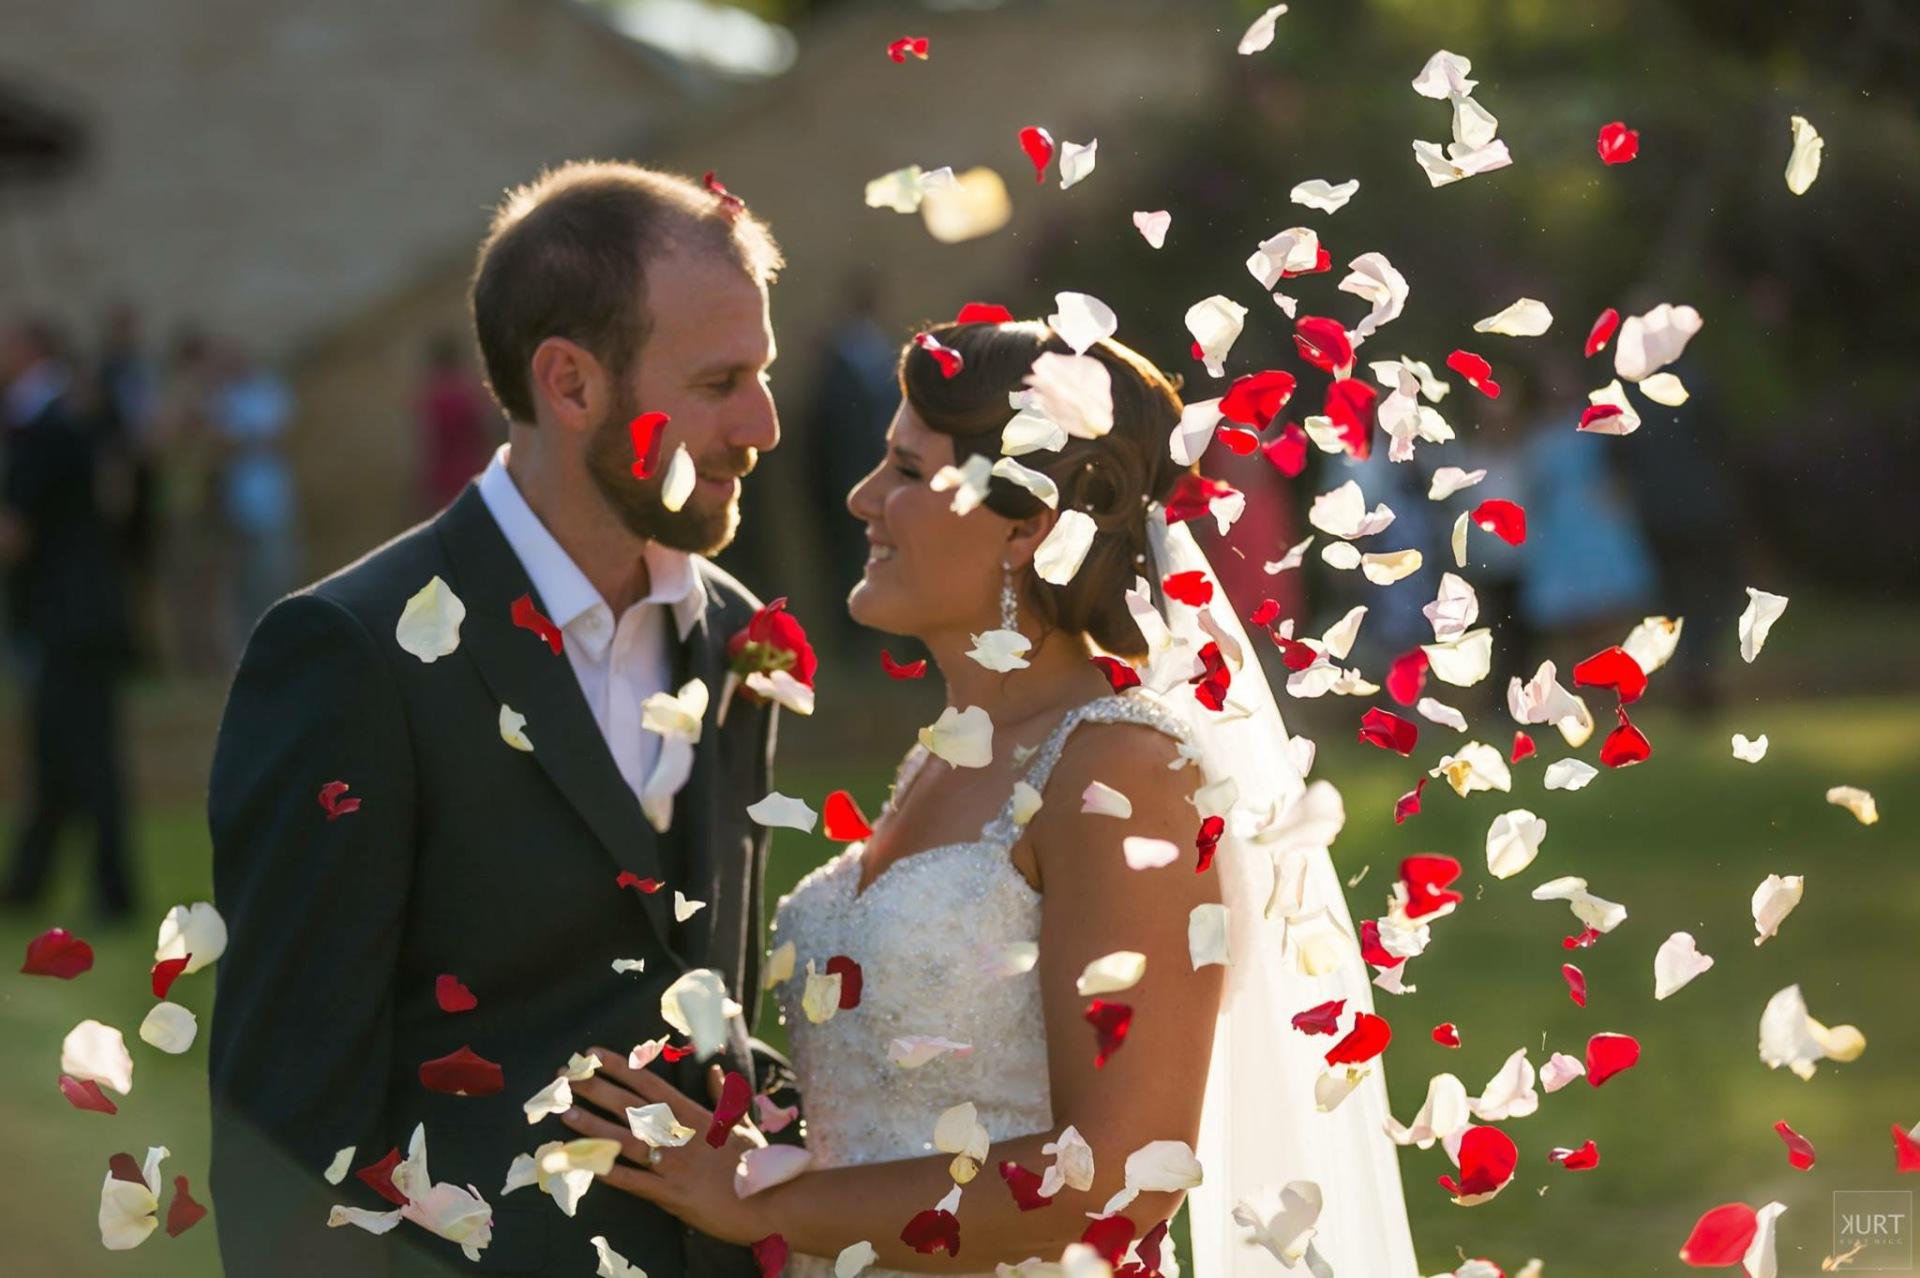 http://www.blakeneyphotography.com